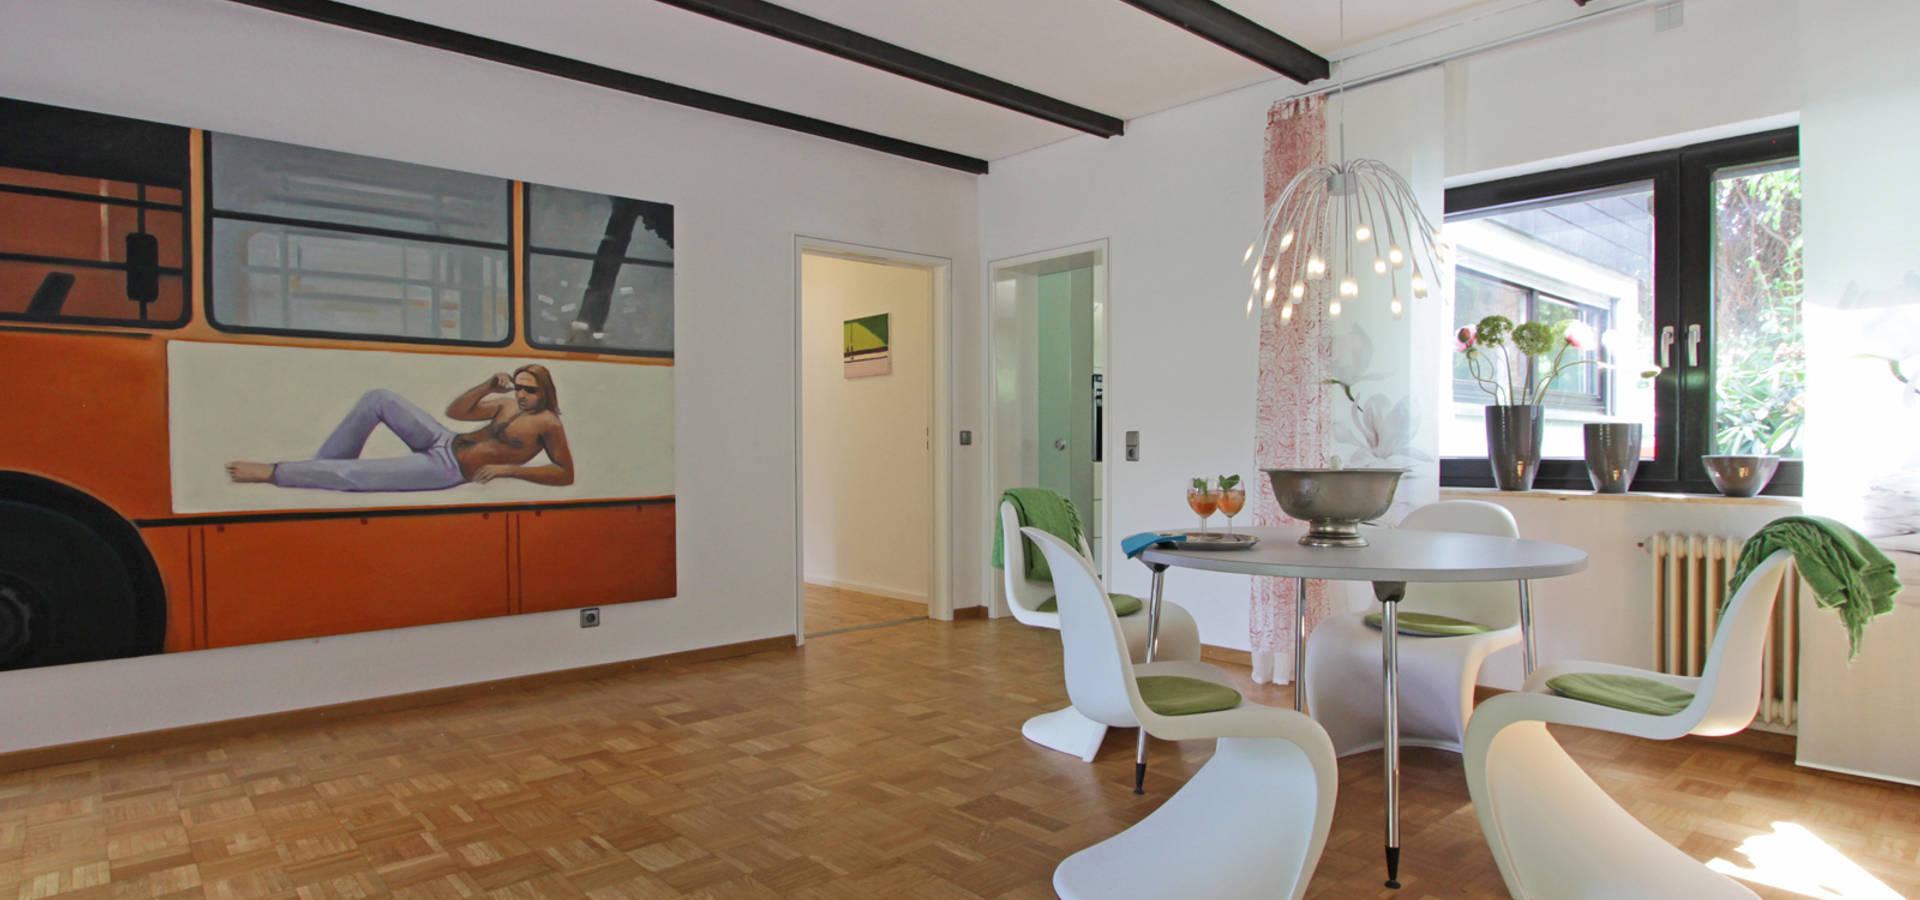 hausundso Immobilien Offenburg